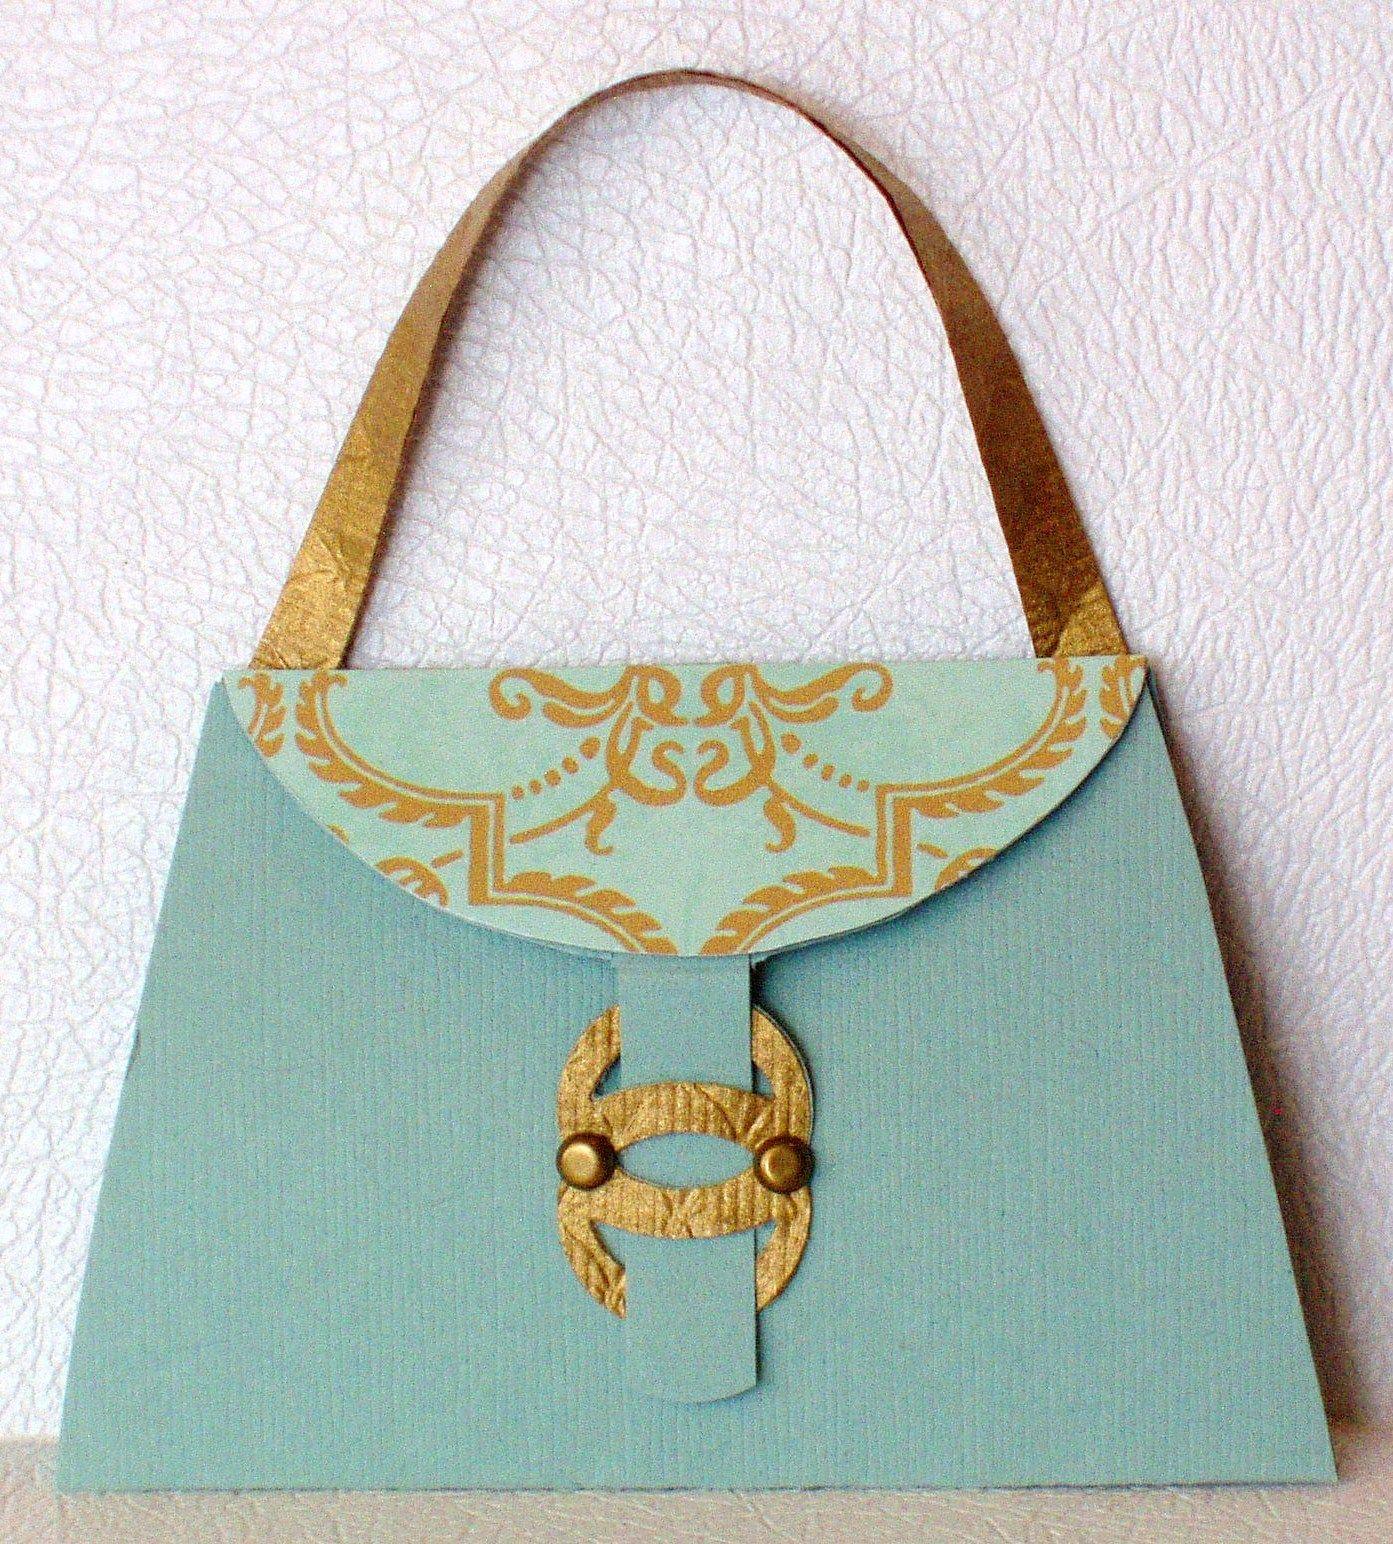 coco chanel teal purse - g.c. card © 2010